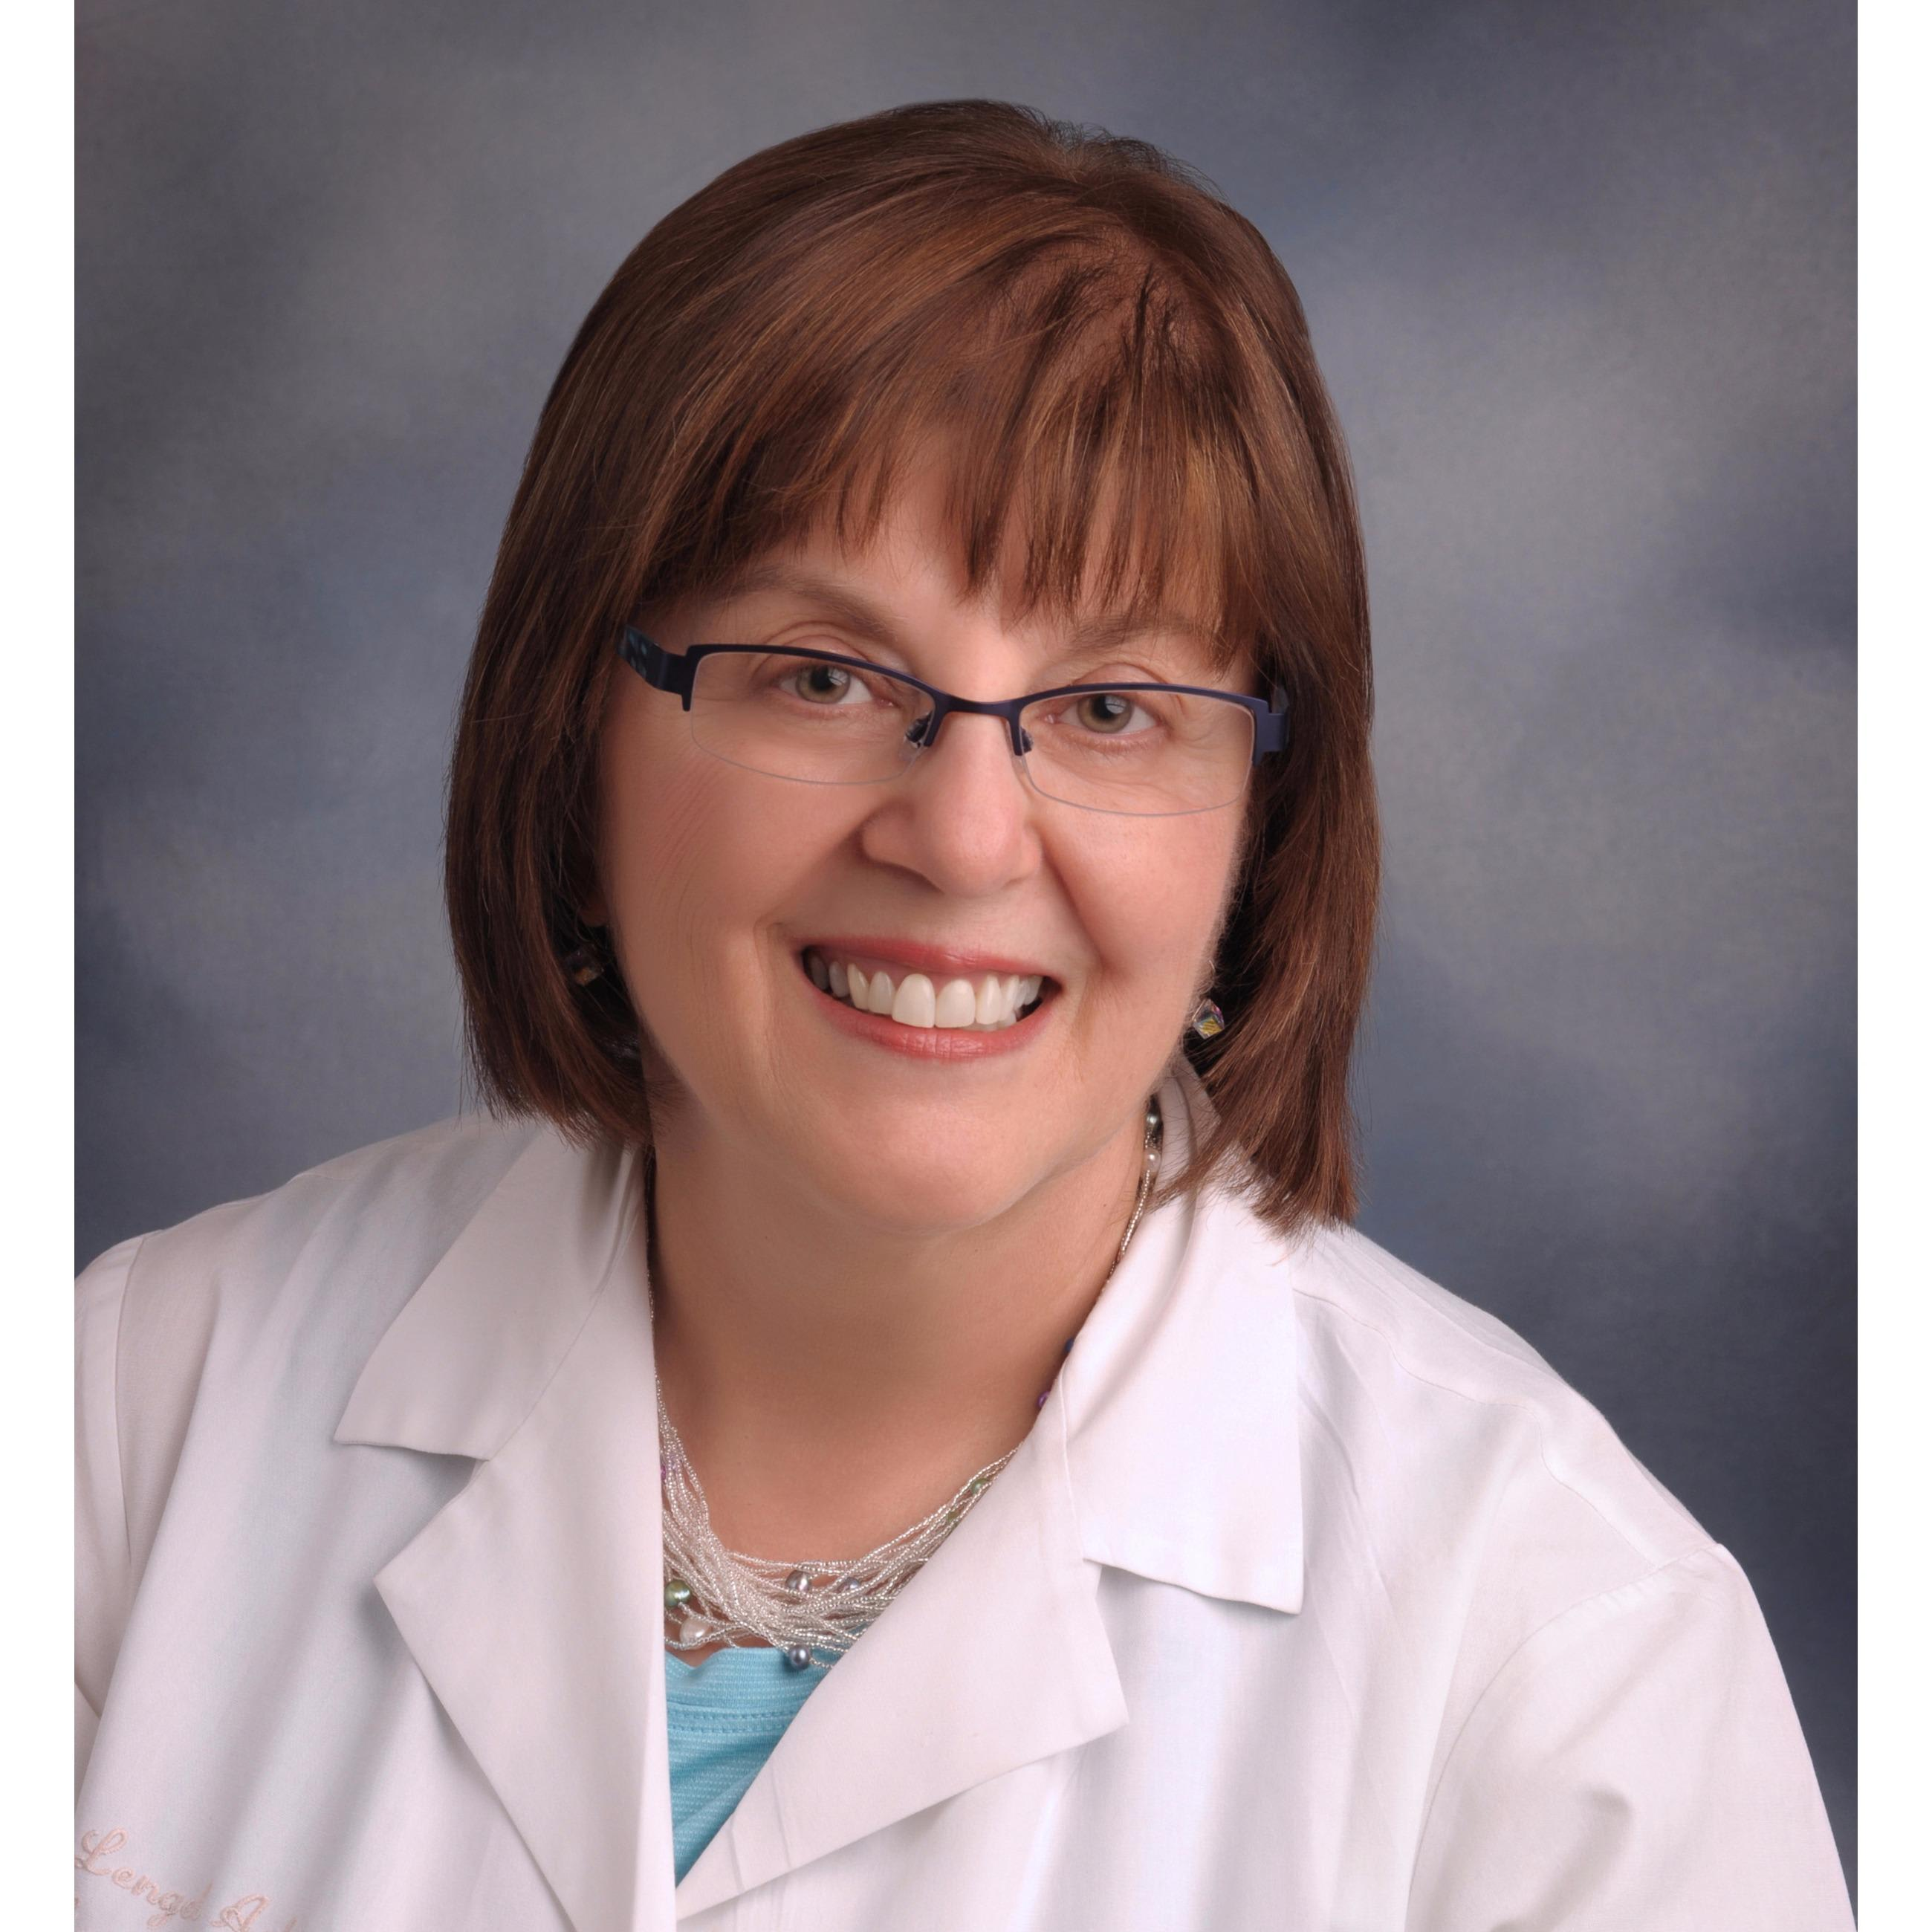 Dr. Freda L Arlow MD